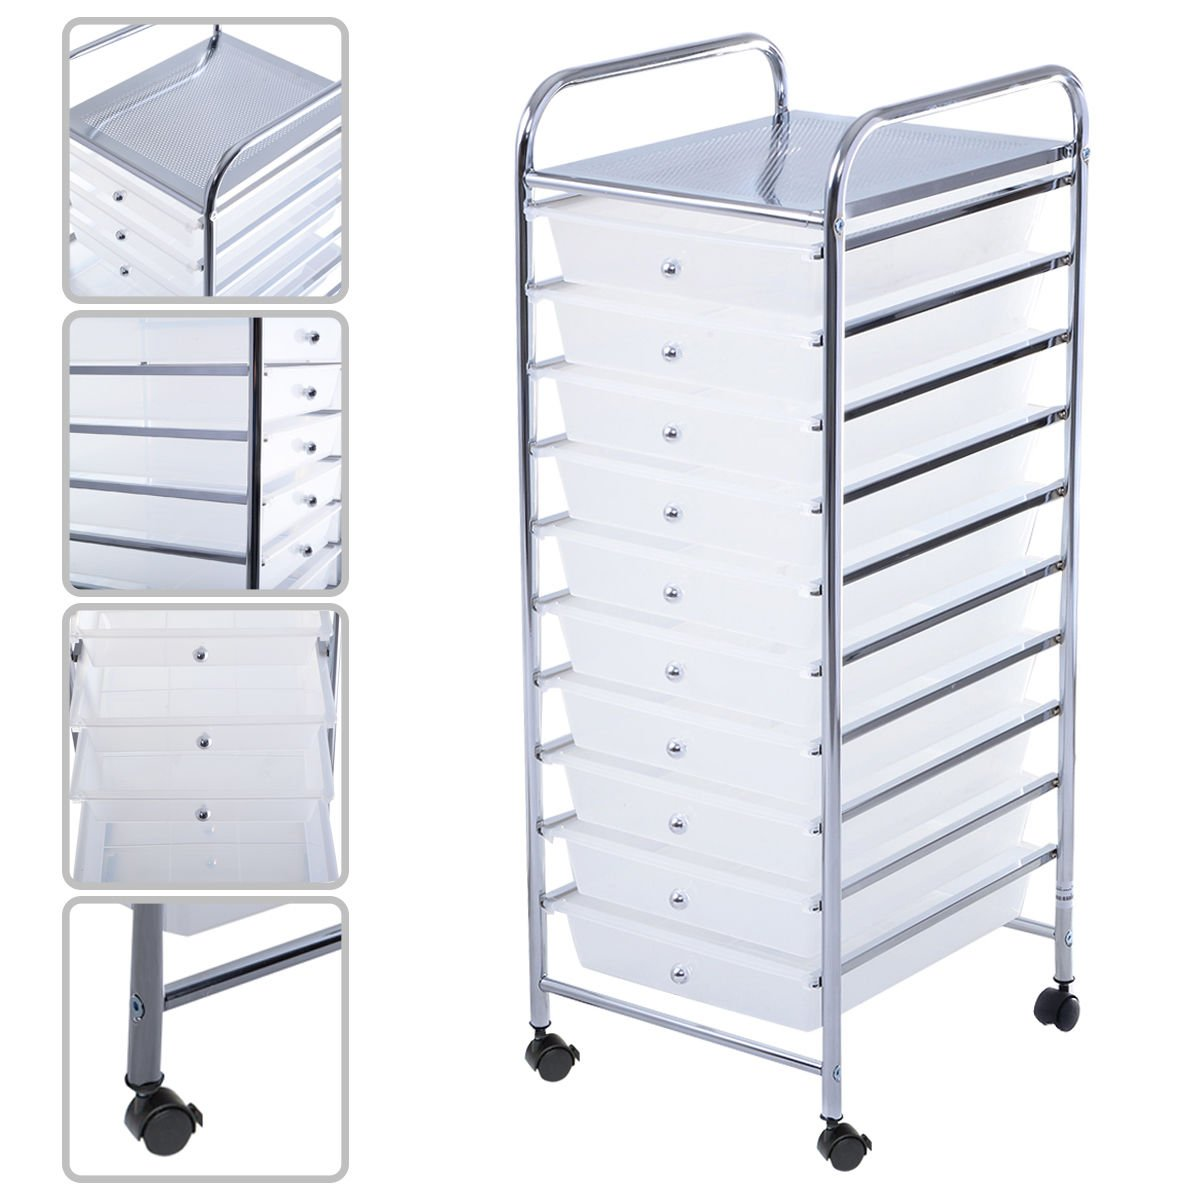 10 Drawer Rolling Storage Cart Scrapbook Paper Office School Organizer Clear by Zavrotsky